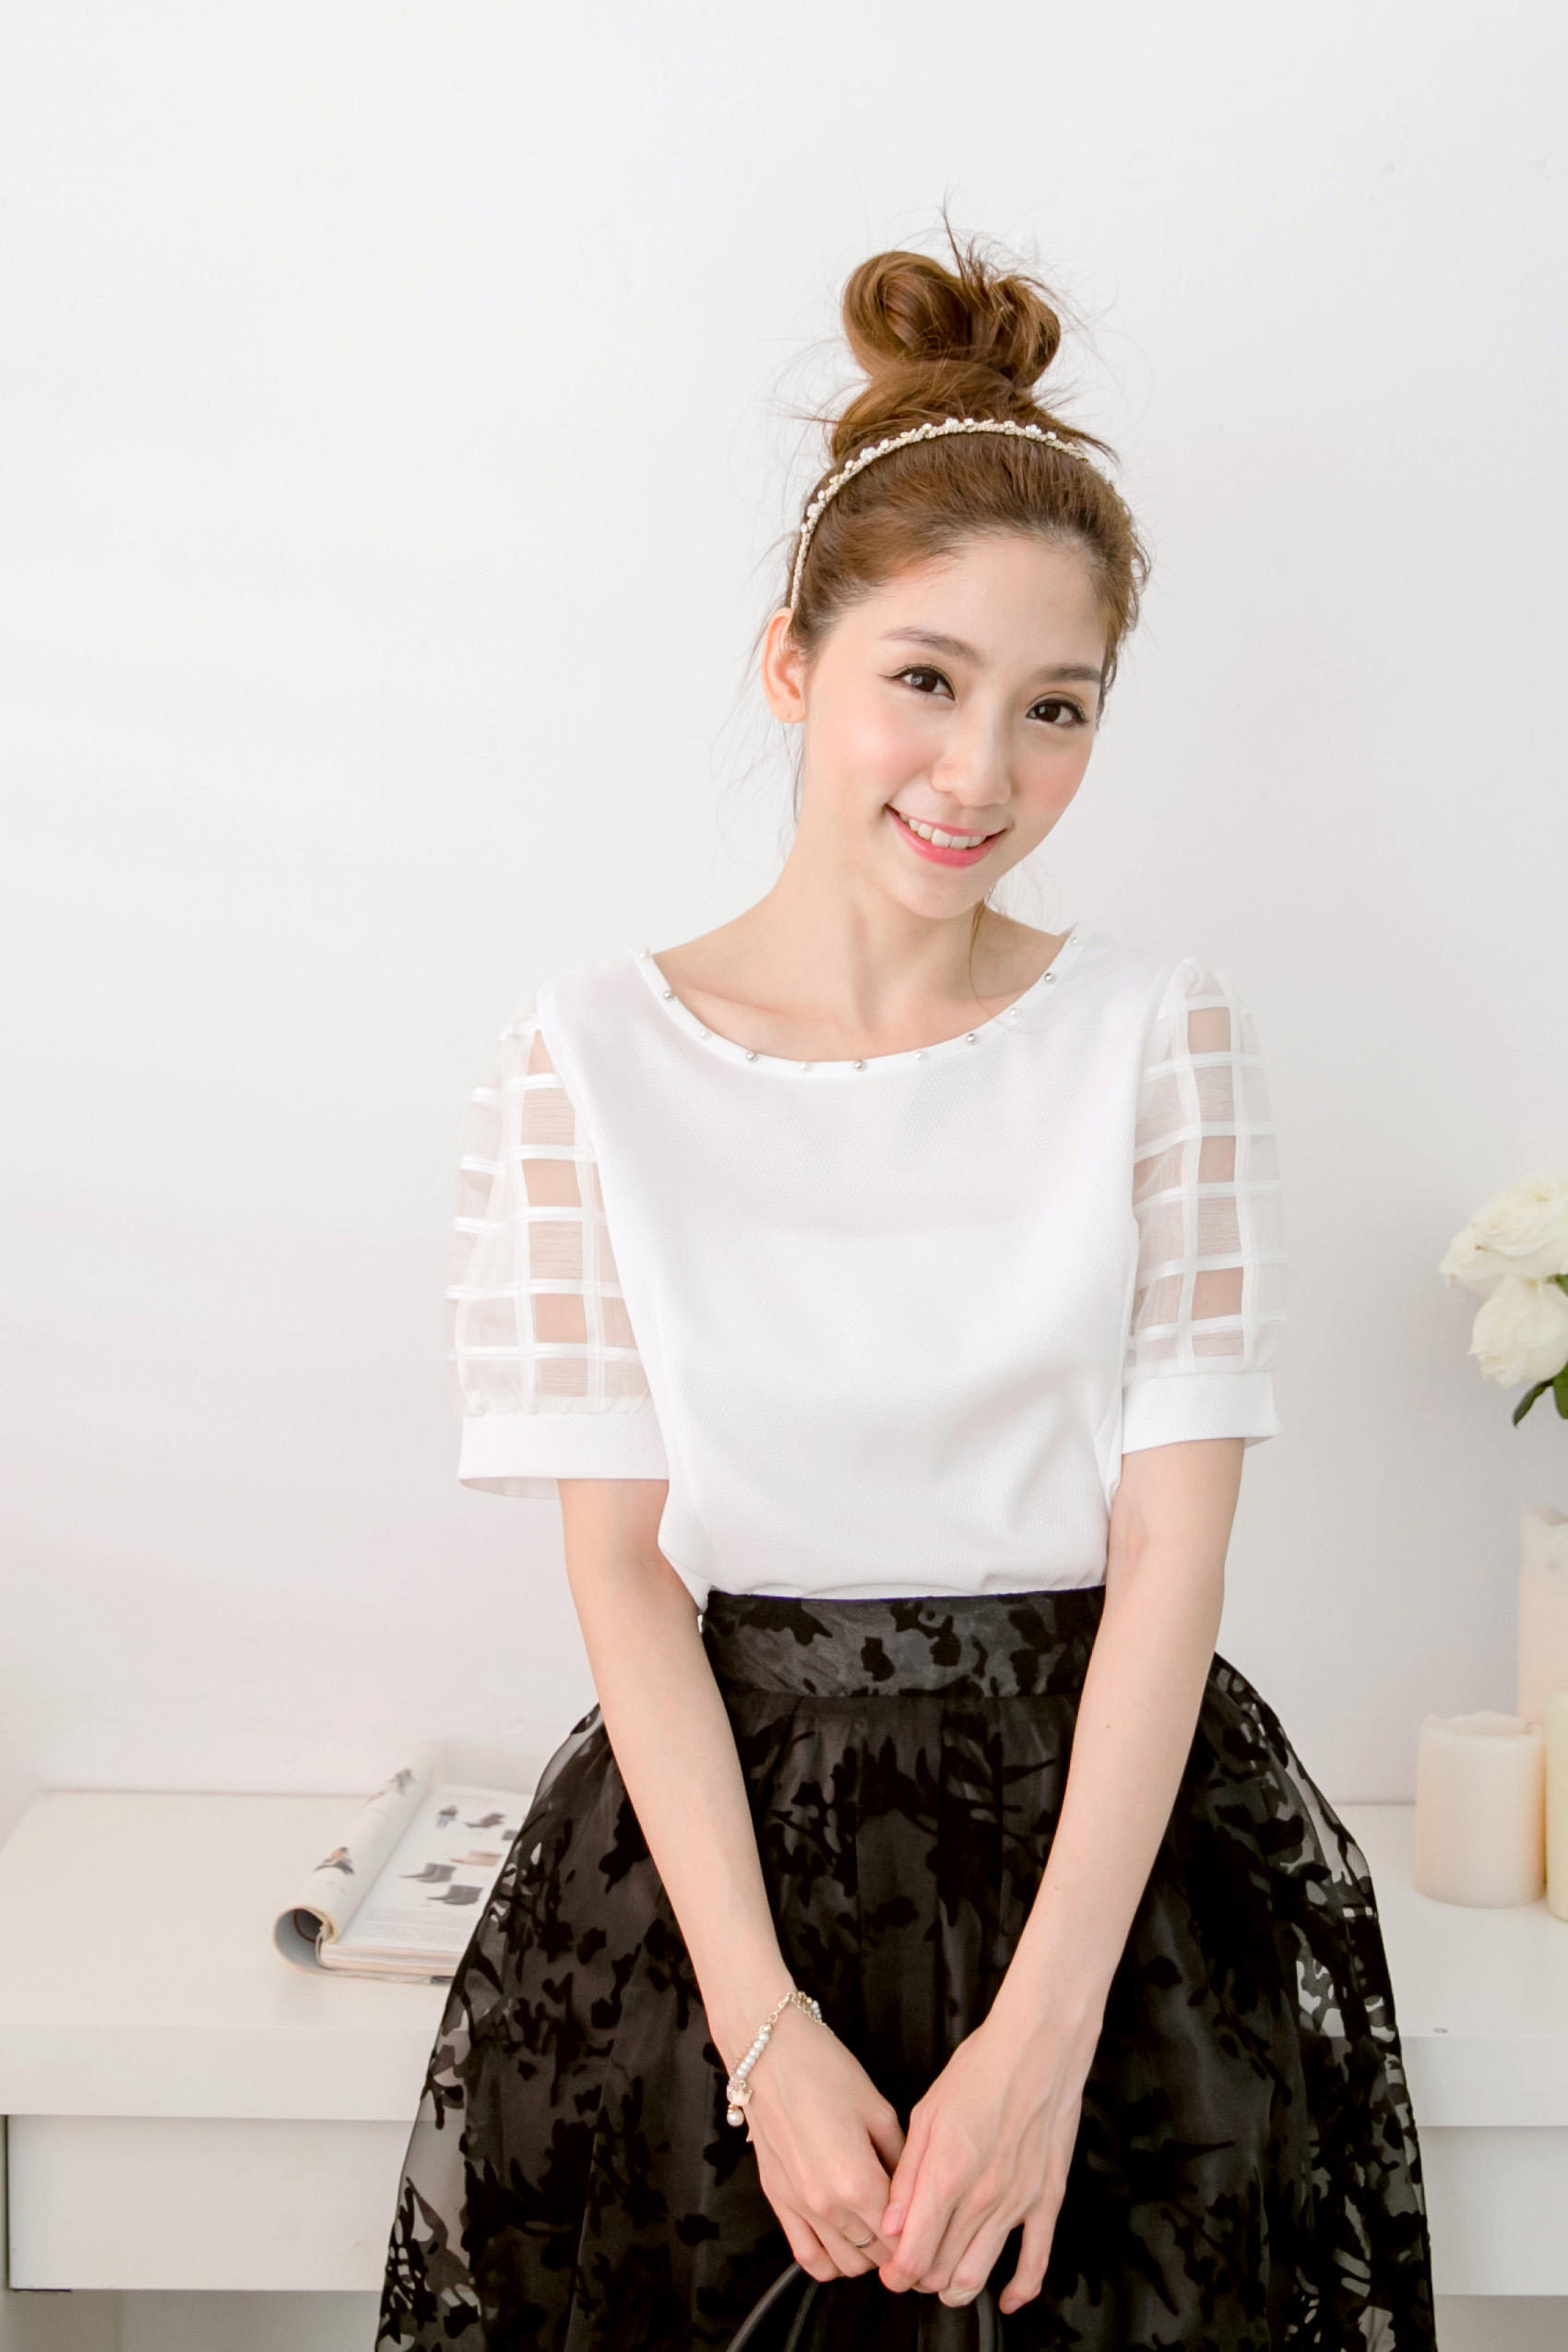 Mayuki Womens Plaid Sheer Chiffon Sleeve Top With Studs Japanese/Korean Fashion